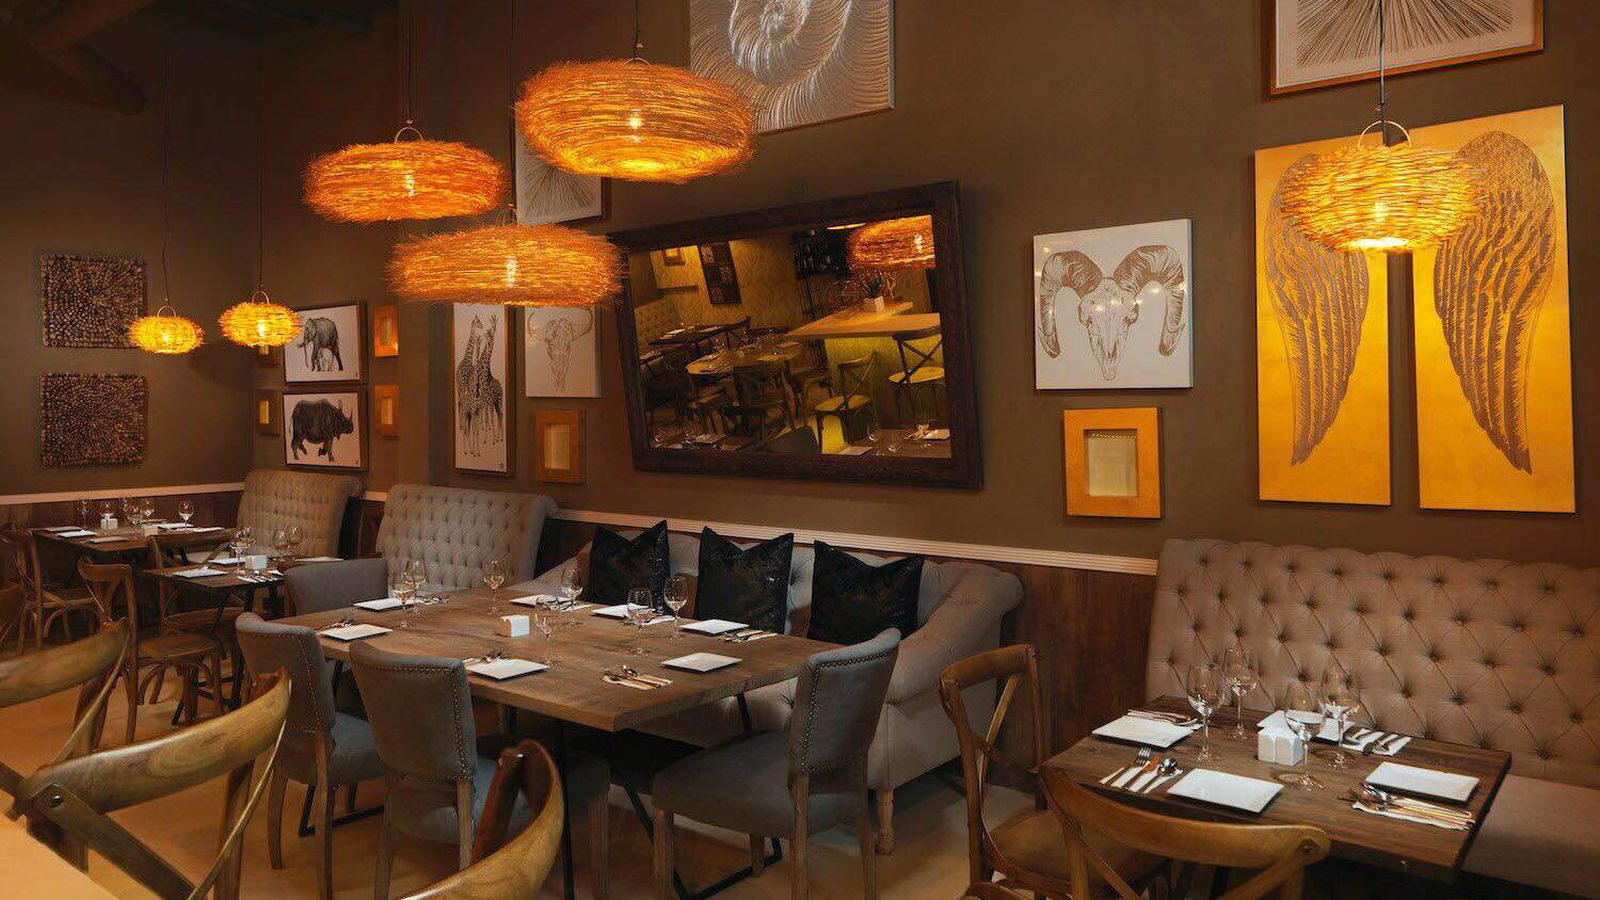 Ocio Restaurant Miami Menu